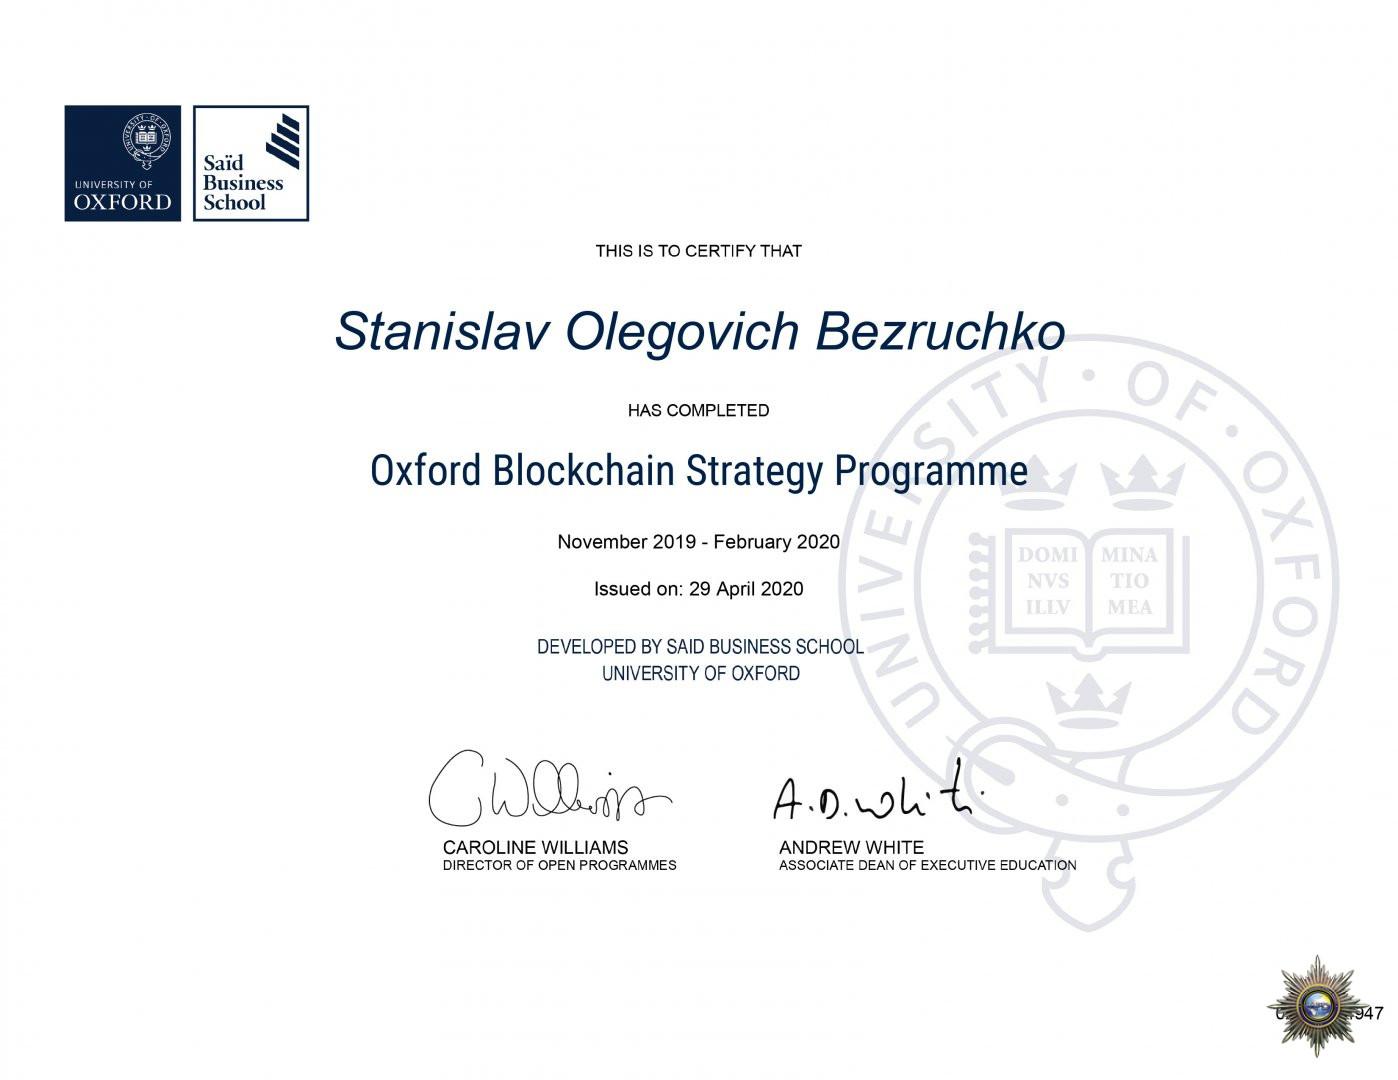 Сертификат Oxford Blockchain Strategy Programme жп.jpg